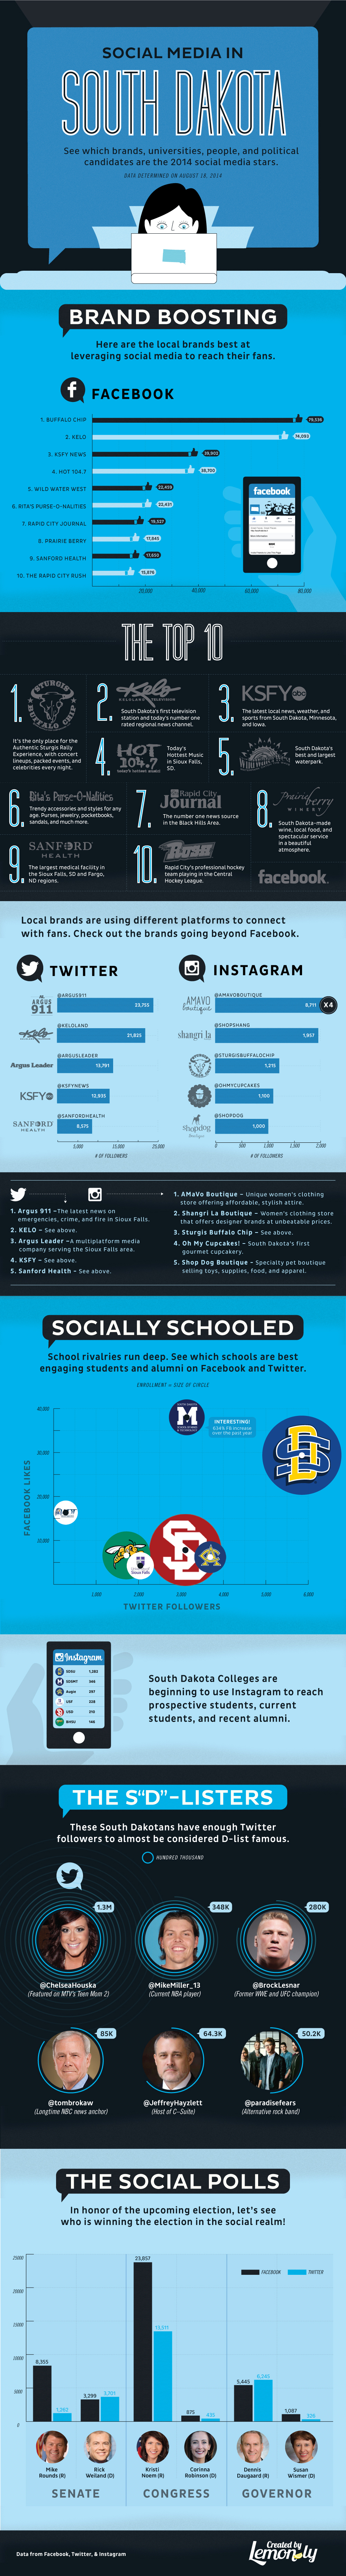 South Dakota Social Media All-Stars 2014